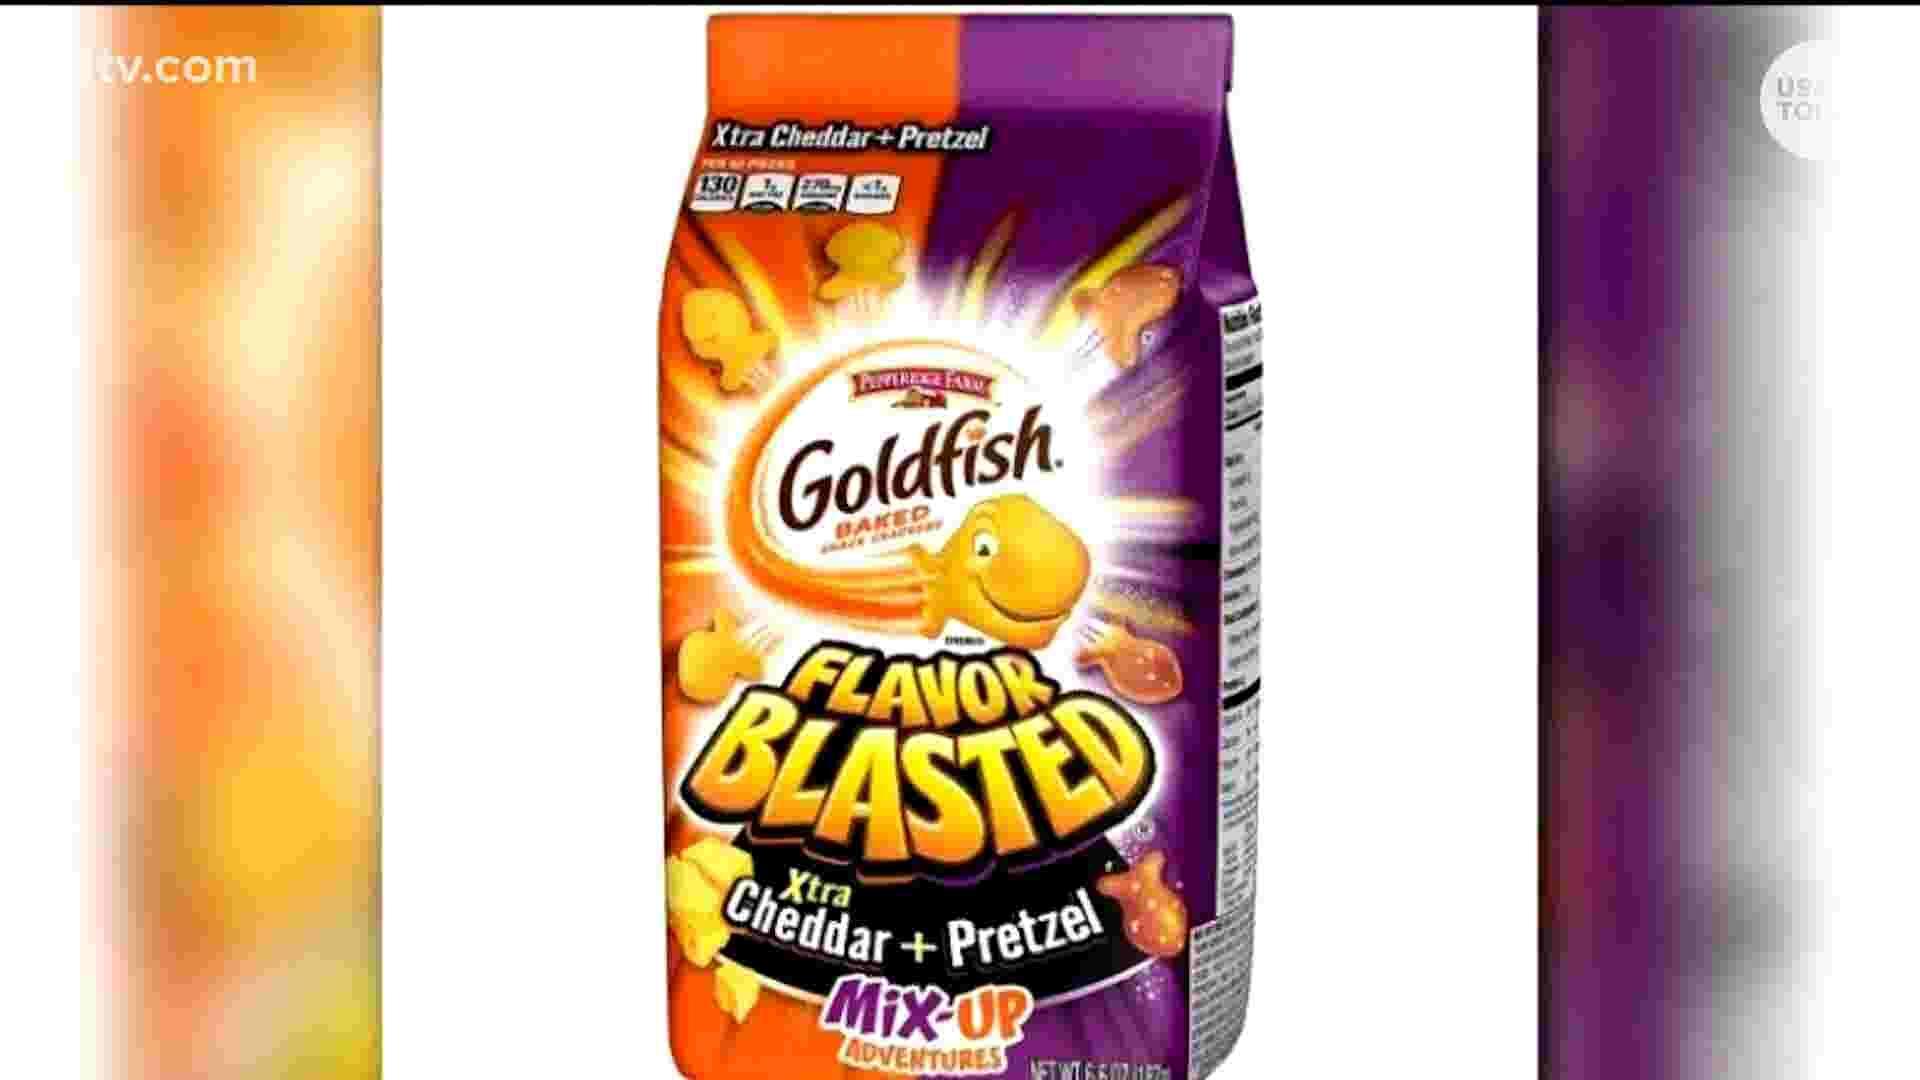 Goldfish Crackers recalled for salmonella